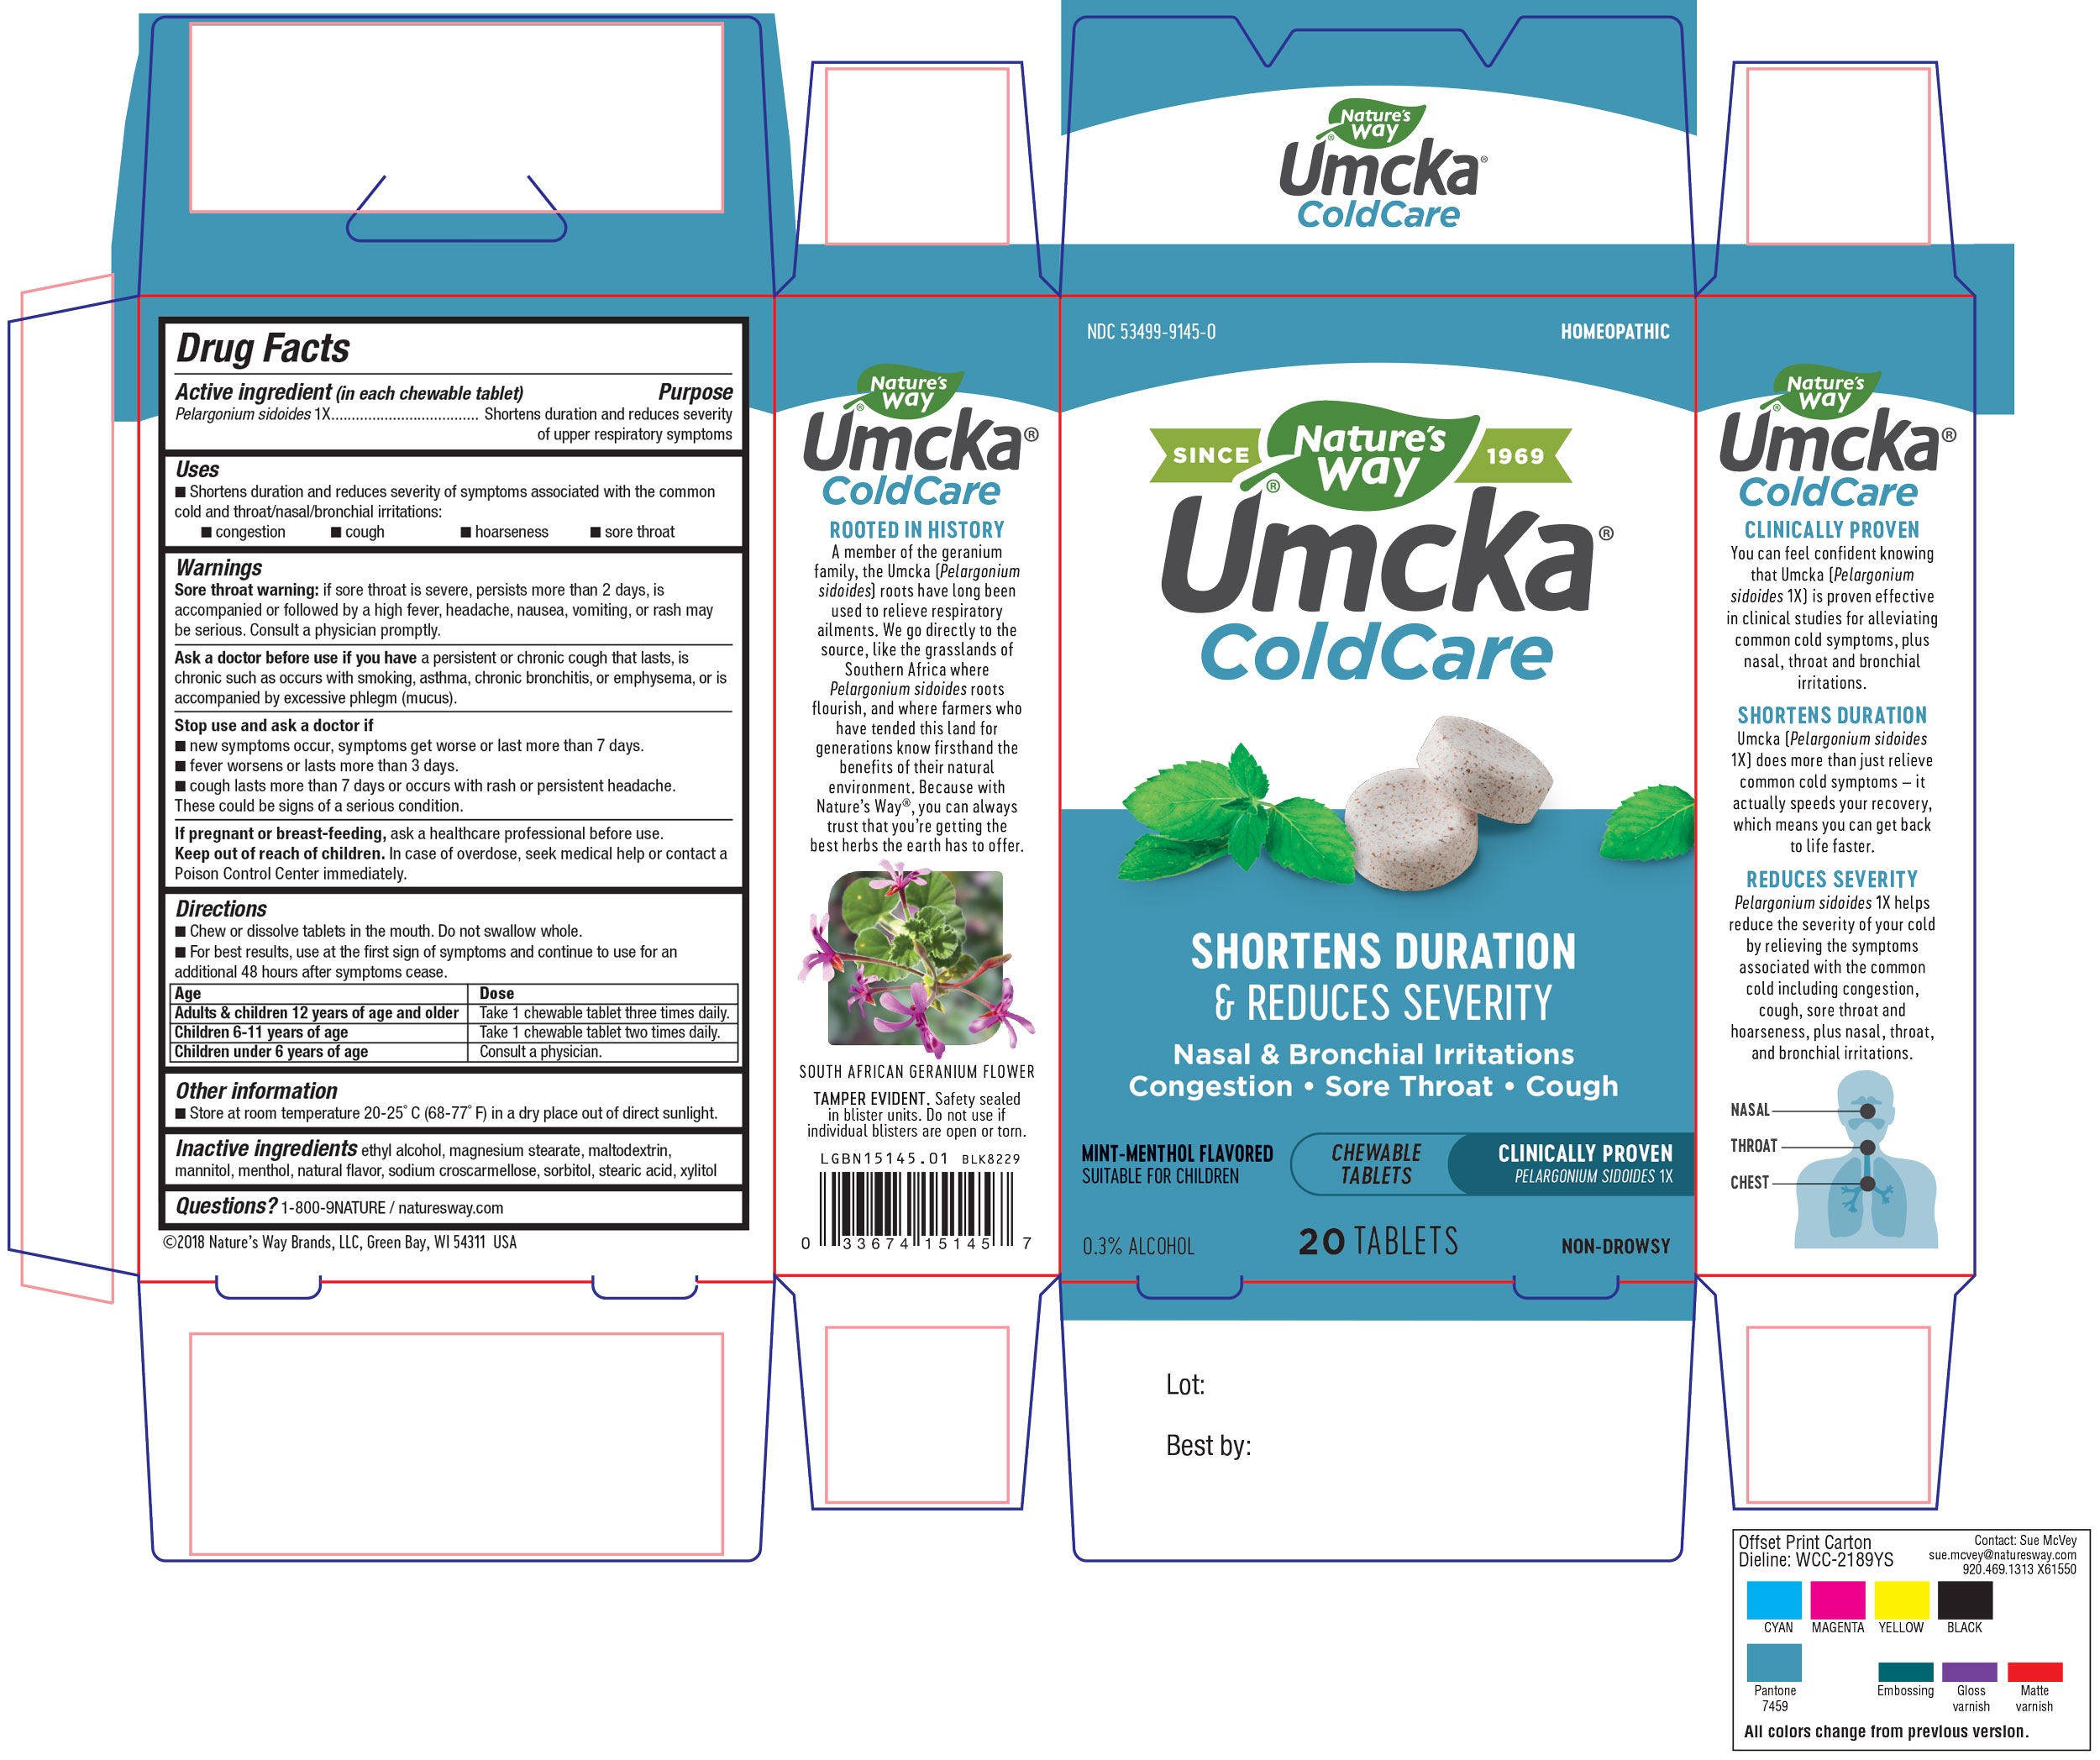 15145-Umcka CC Mint-6.jpg